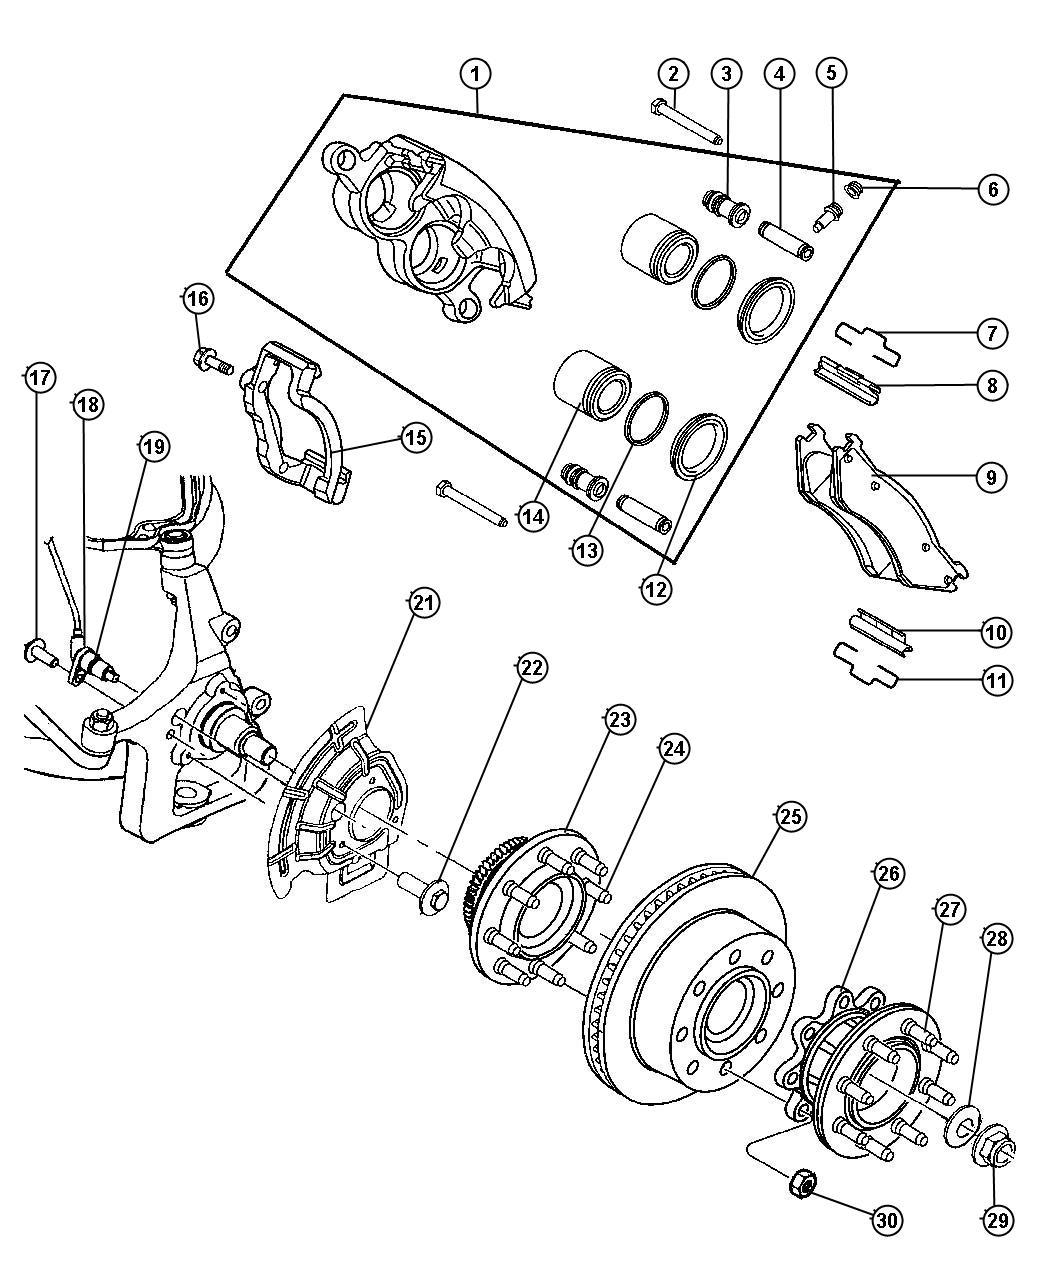 Dodge Ram Caliper Right Disc Brake Mopar Reman Fully Loaded Caliper Assembly